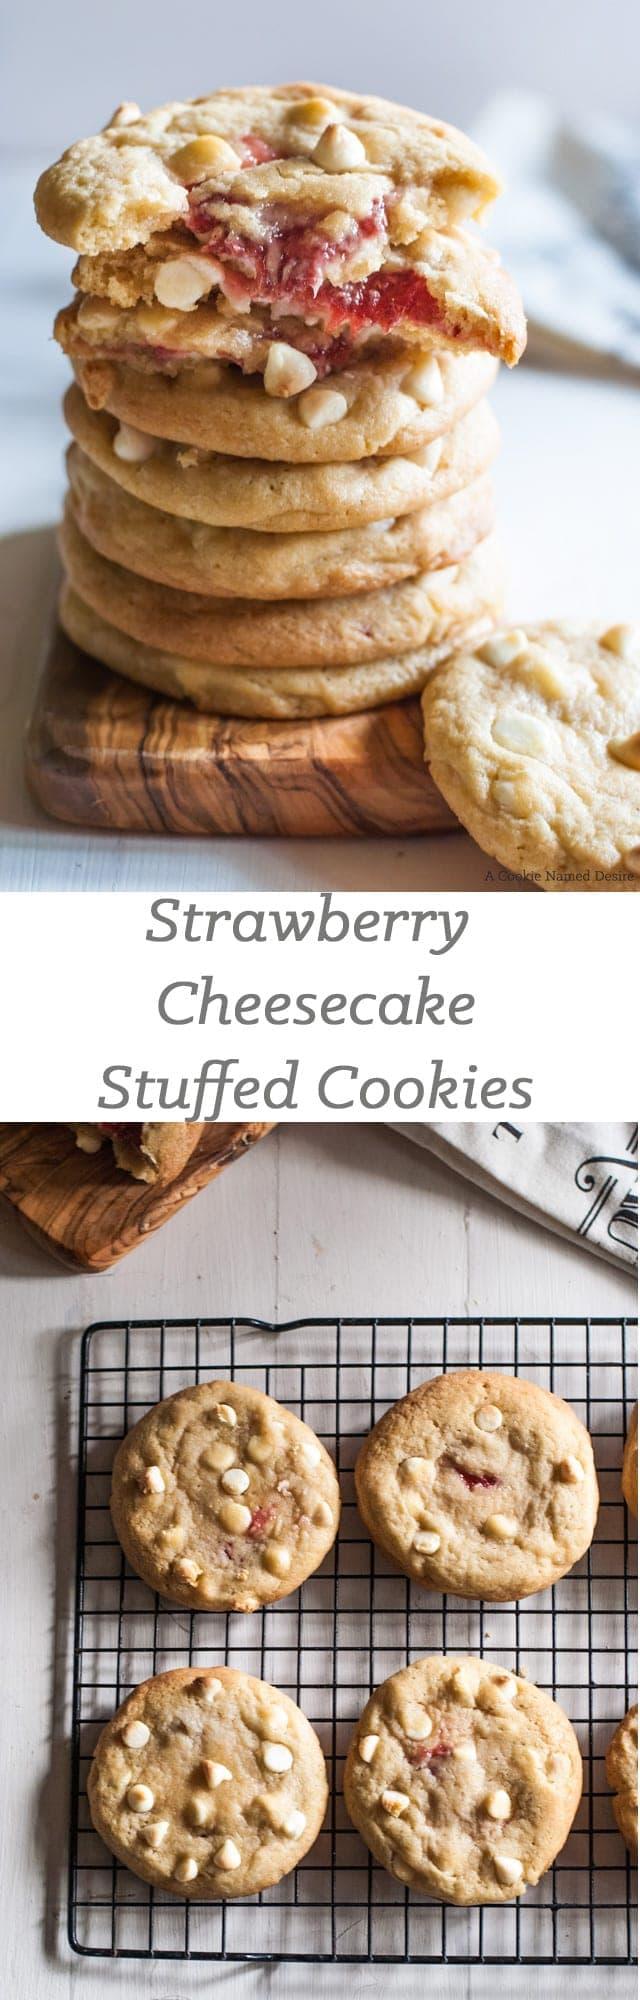 strawberry cheesecake stuffed cookies recipe